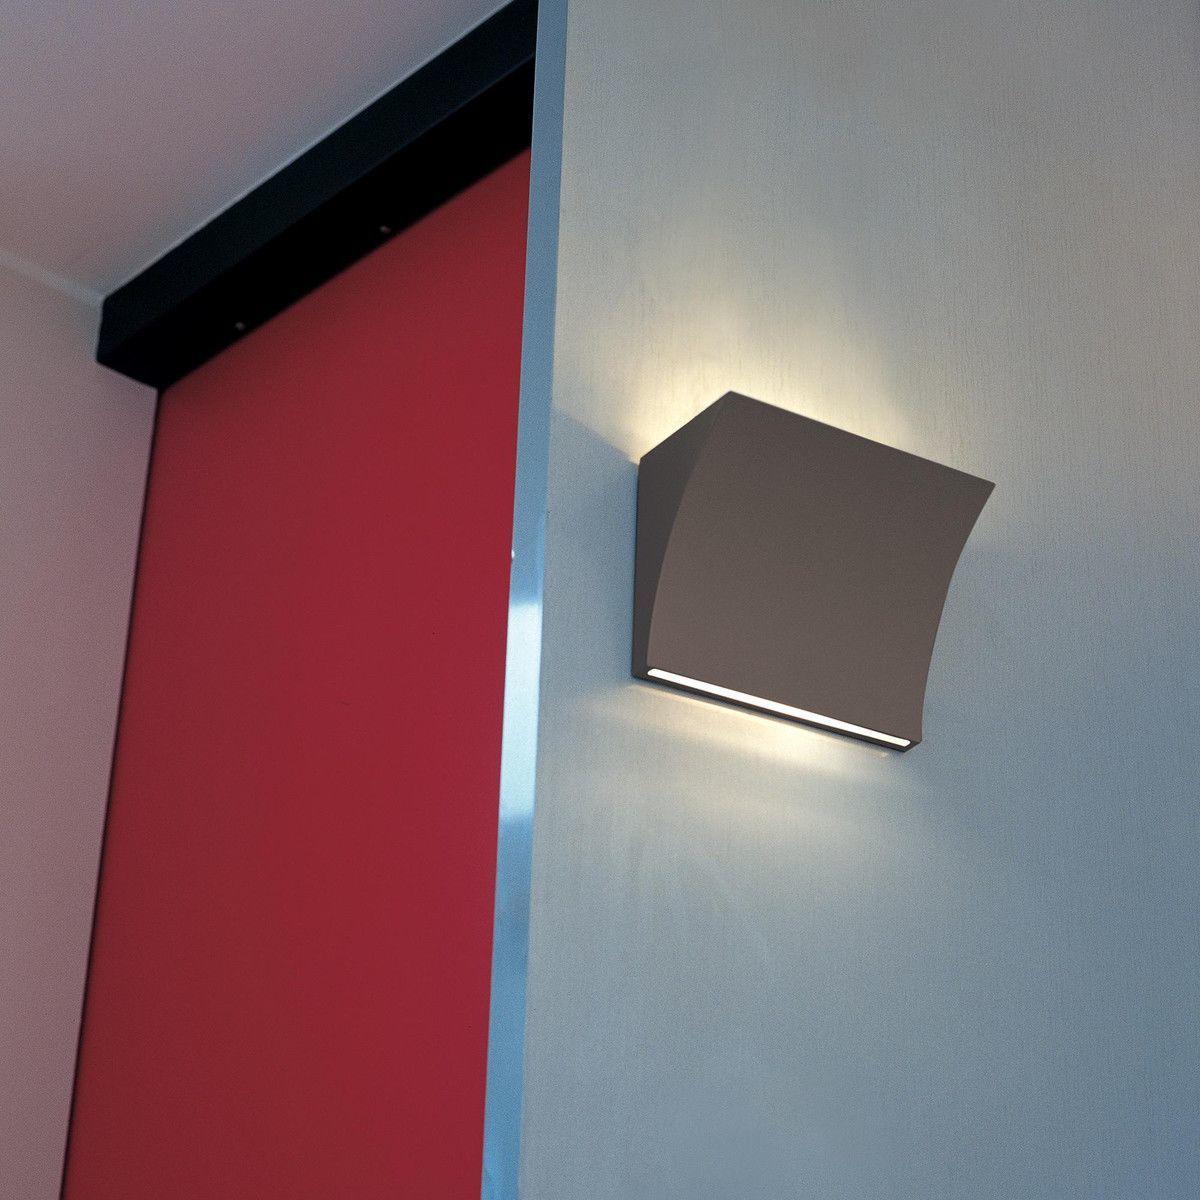 Pochette Wall Lamp